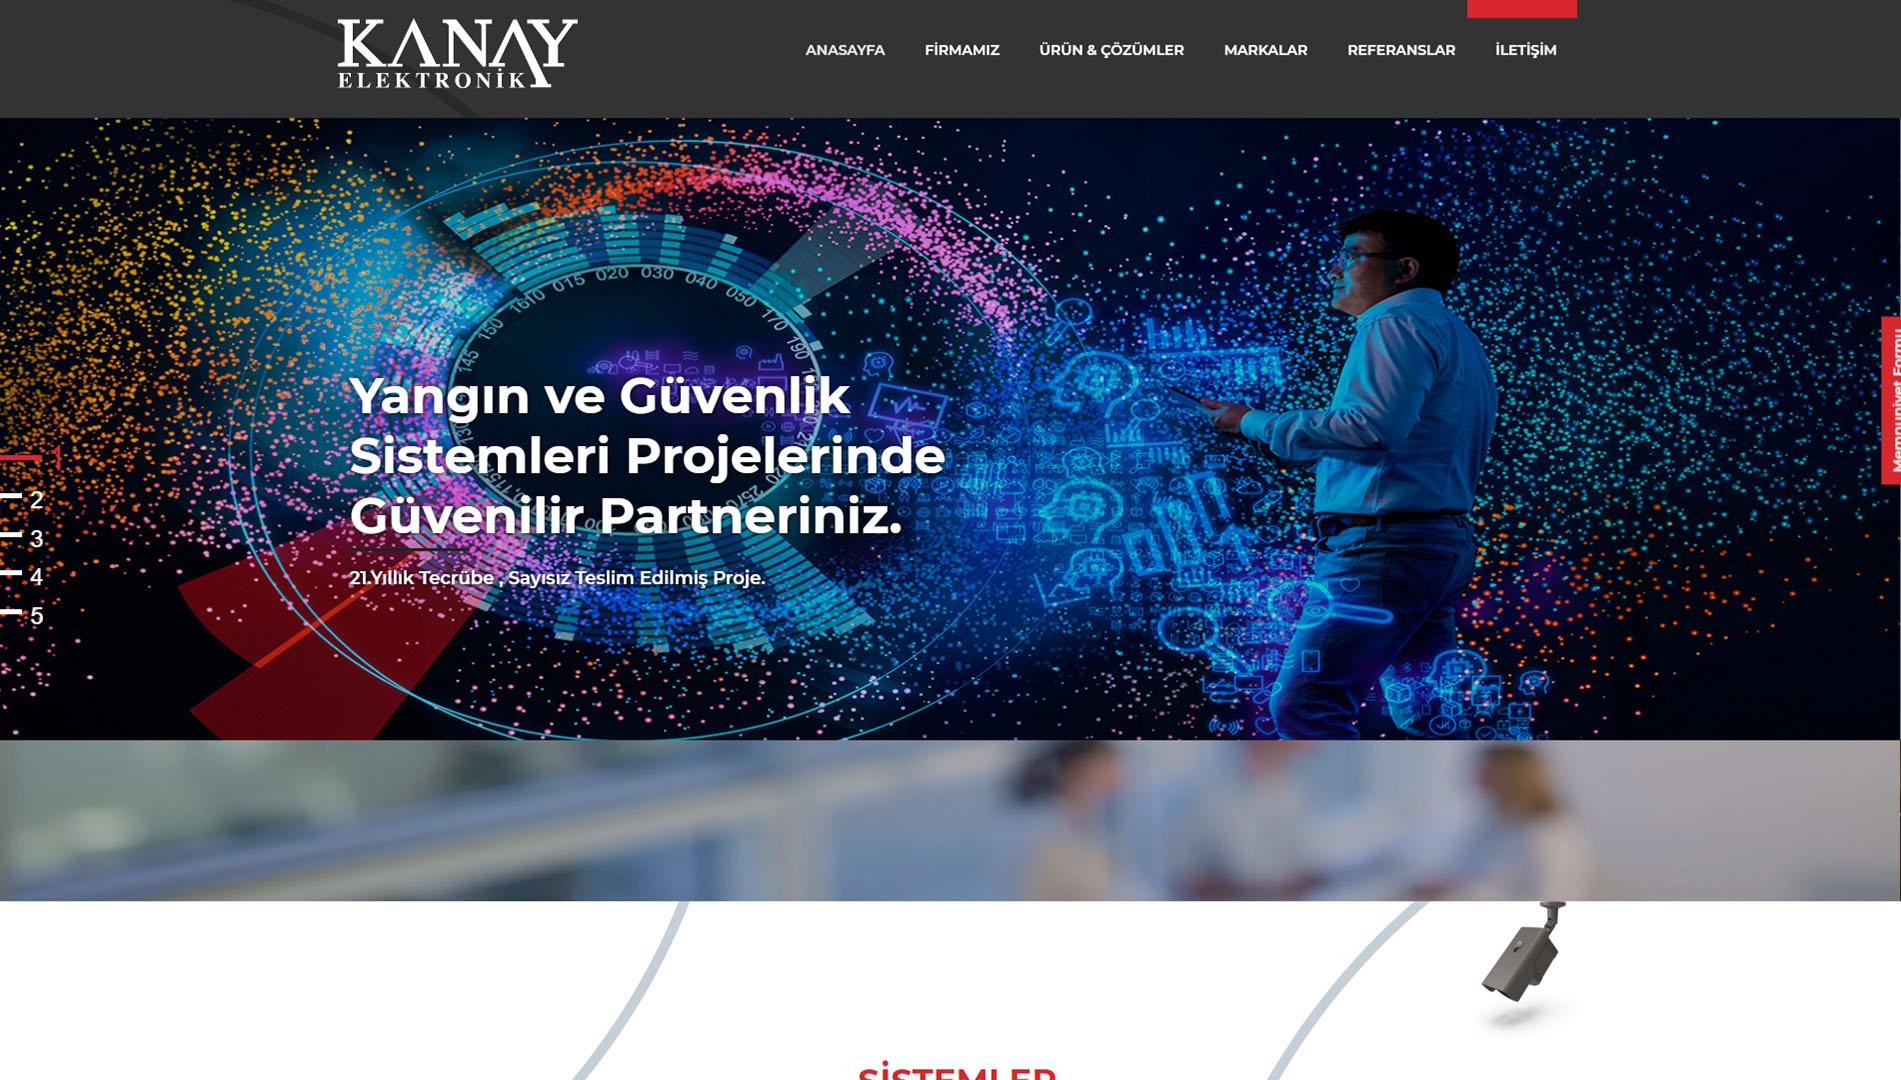 Kanay Elektronik